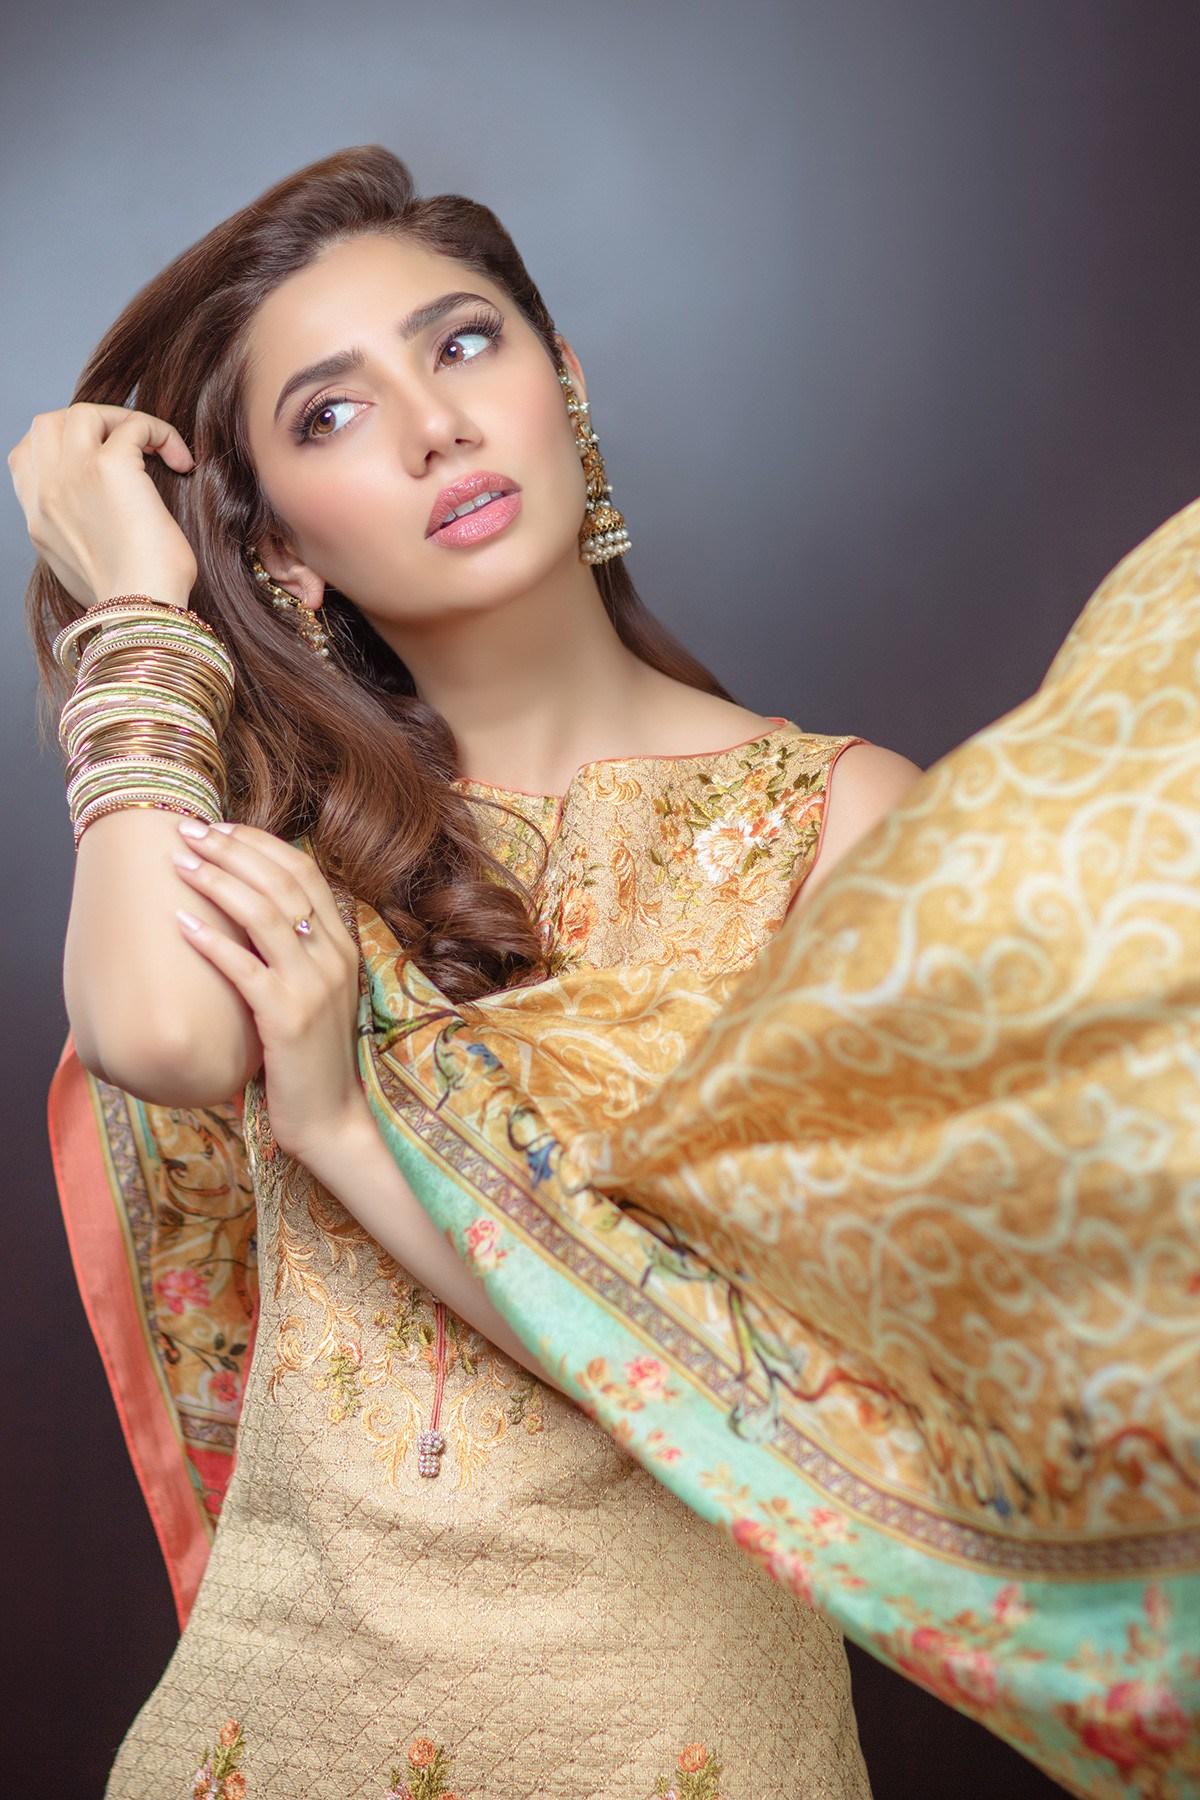 New hairstyle 2018 girl pakistani